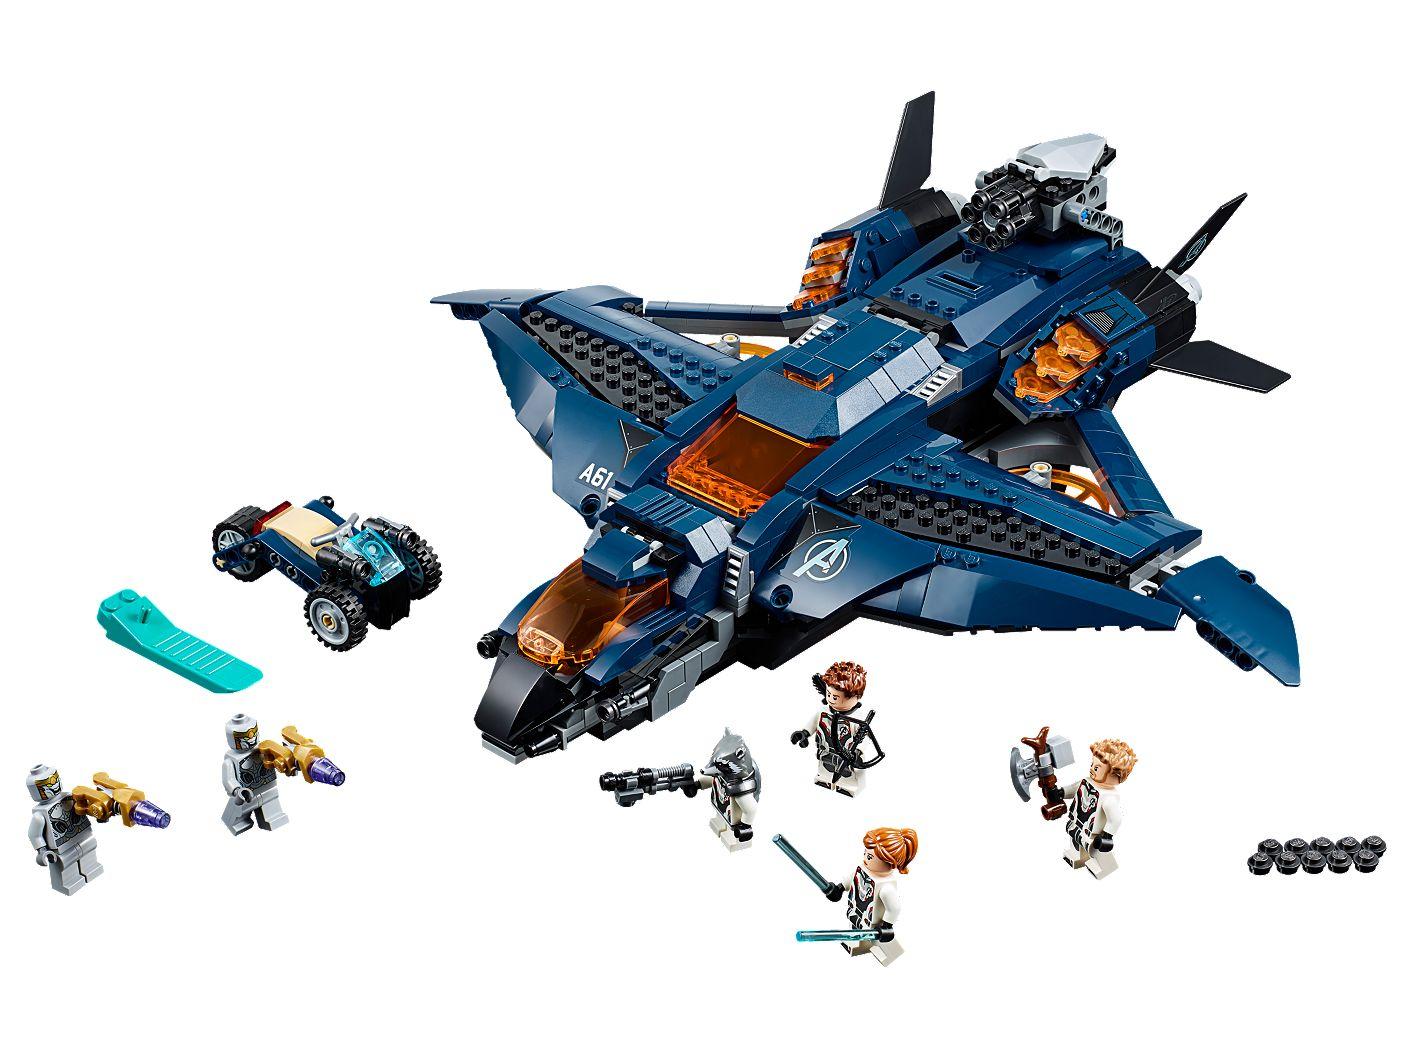 Des 76126Marvel Le Avengers Quinjet Lego Super Shop Heroes Ovw80mnN